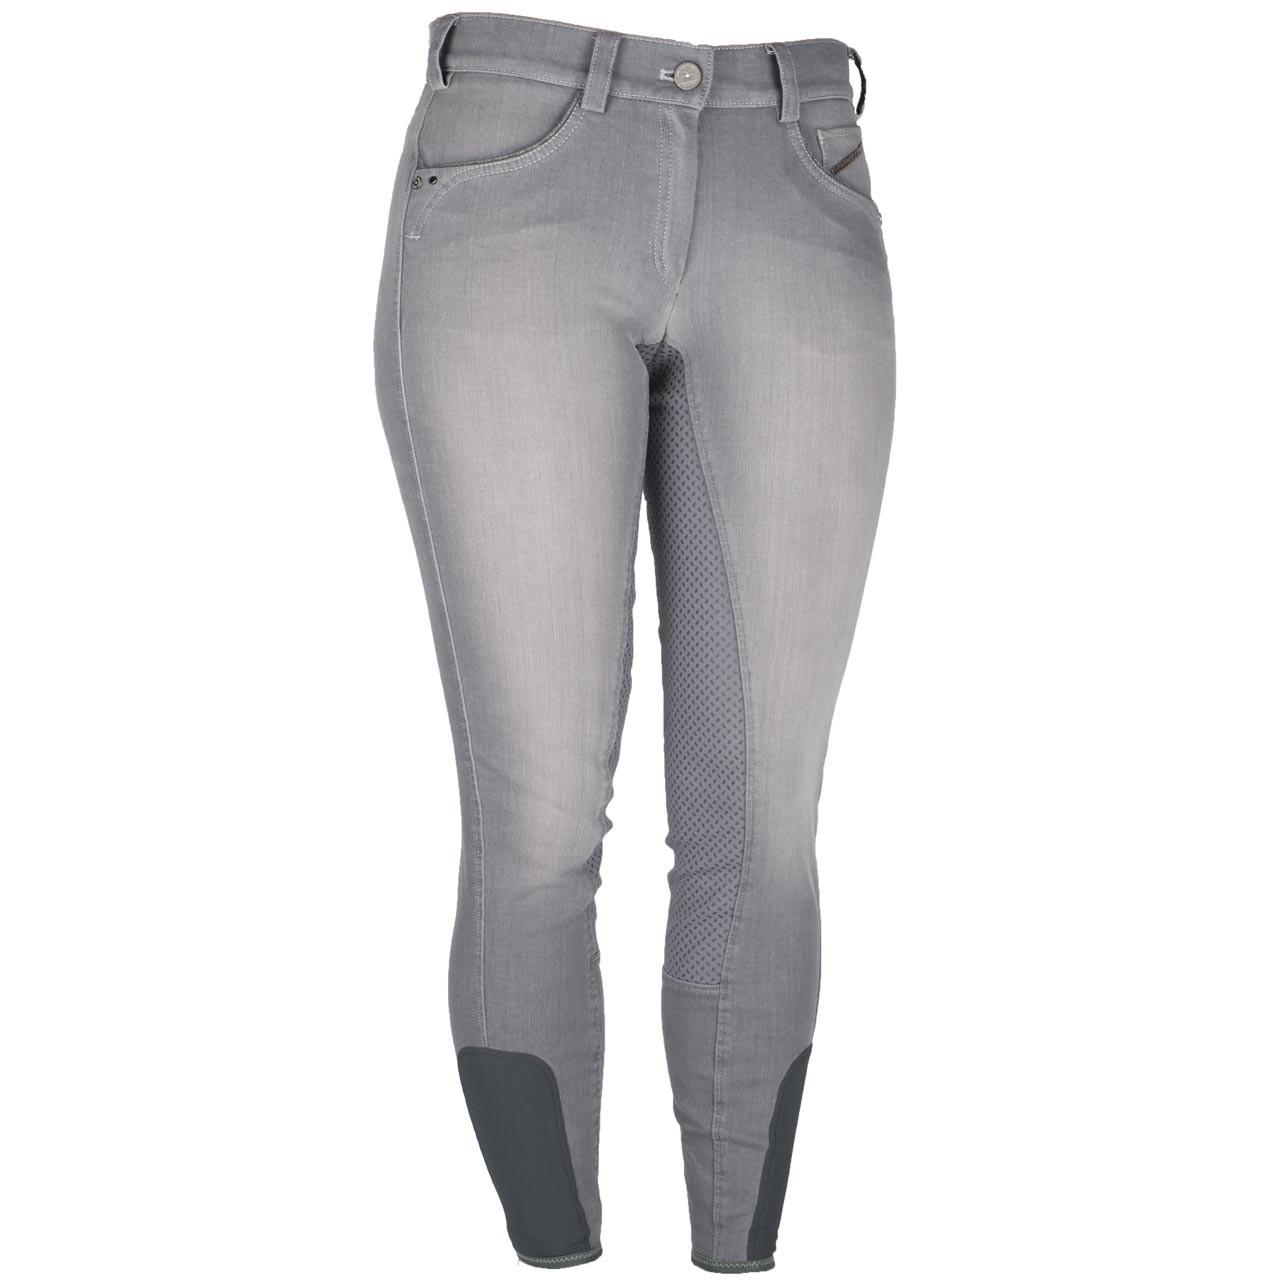 Pikeur Darjeen Grip jeans rijbroek